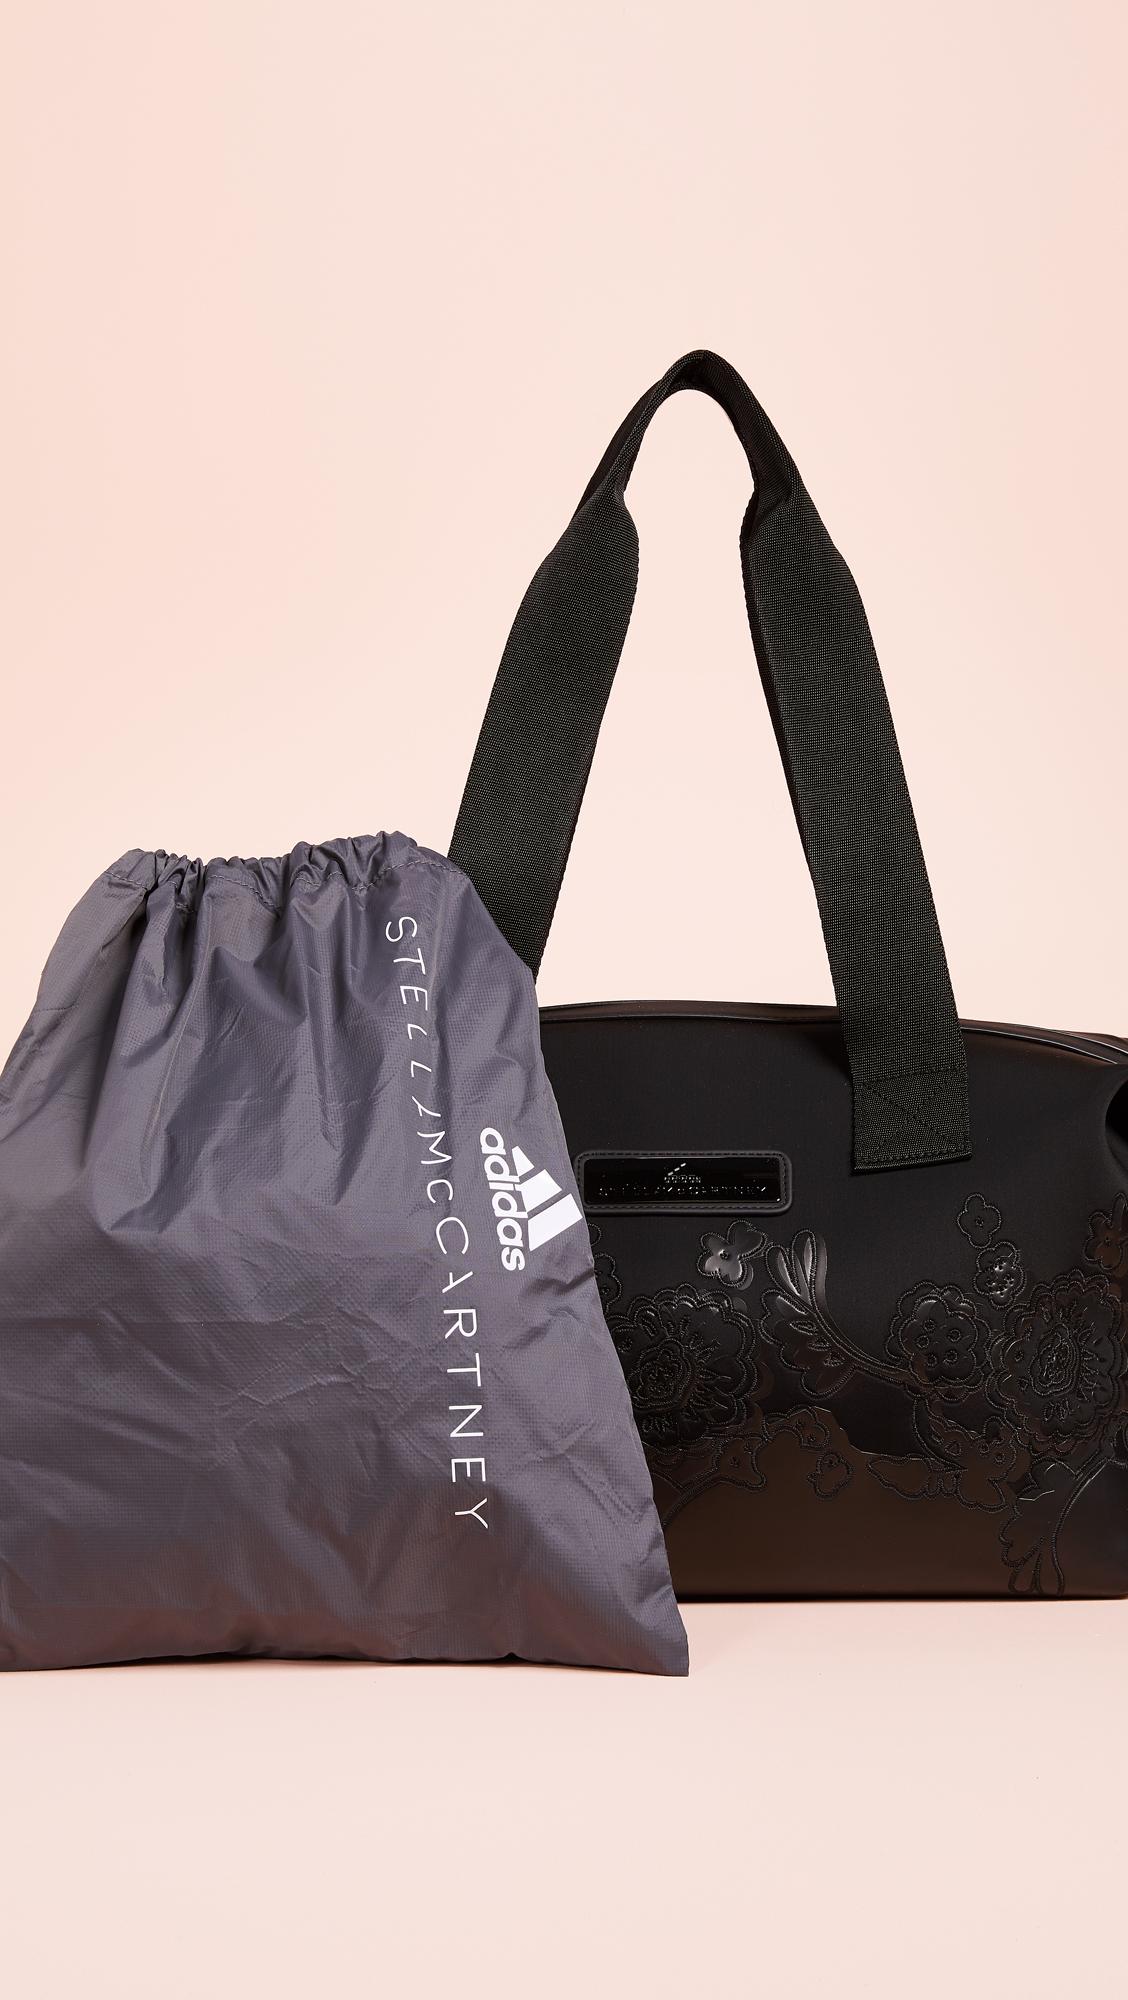 8c92793c3db7 adidas by Stella McCartney Маленькая сумка для спортзала | SHOPBOP